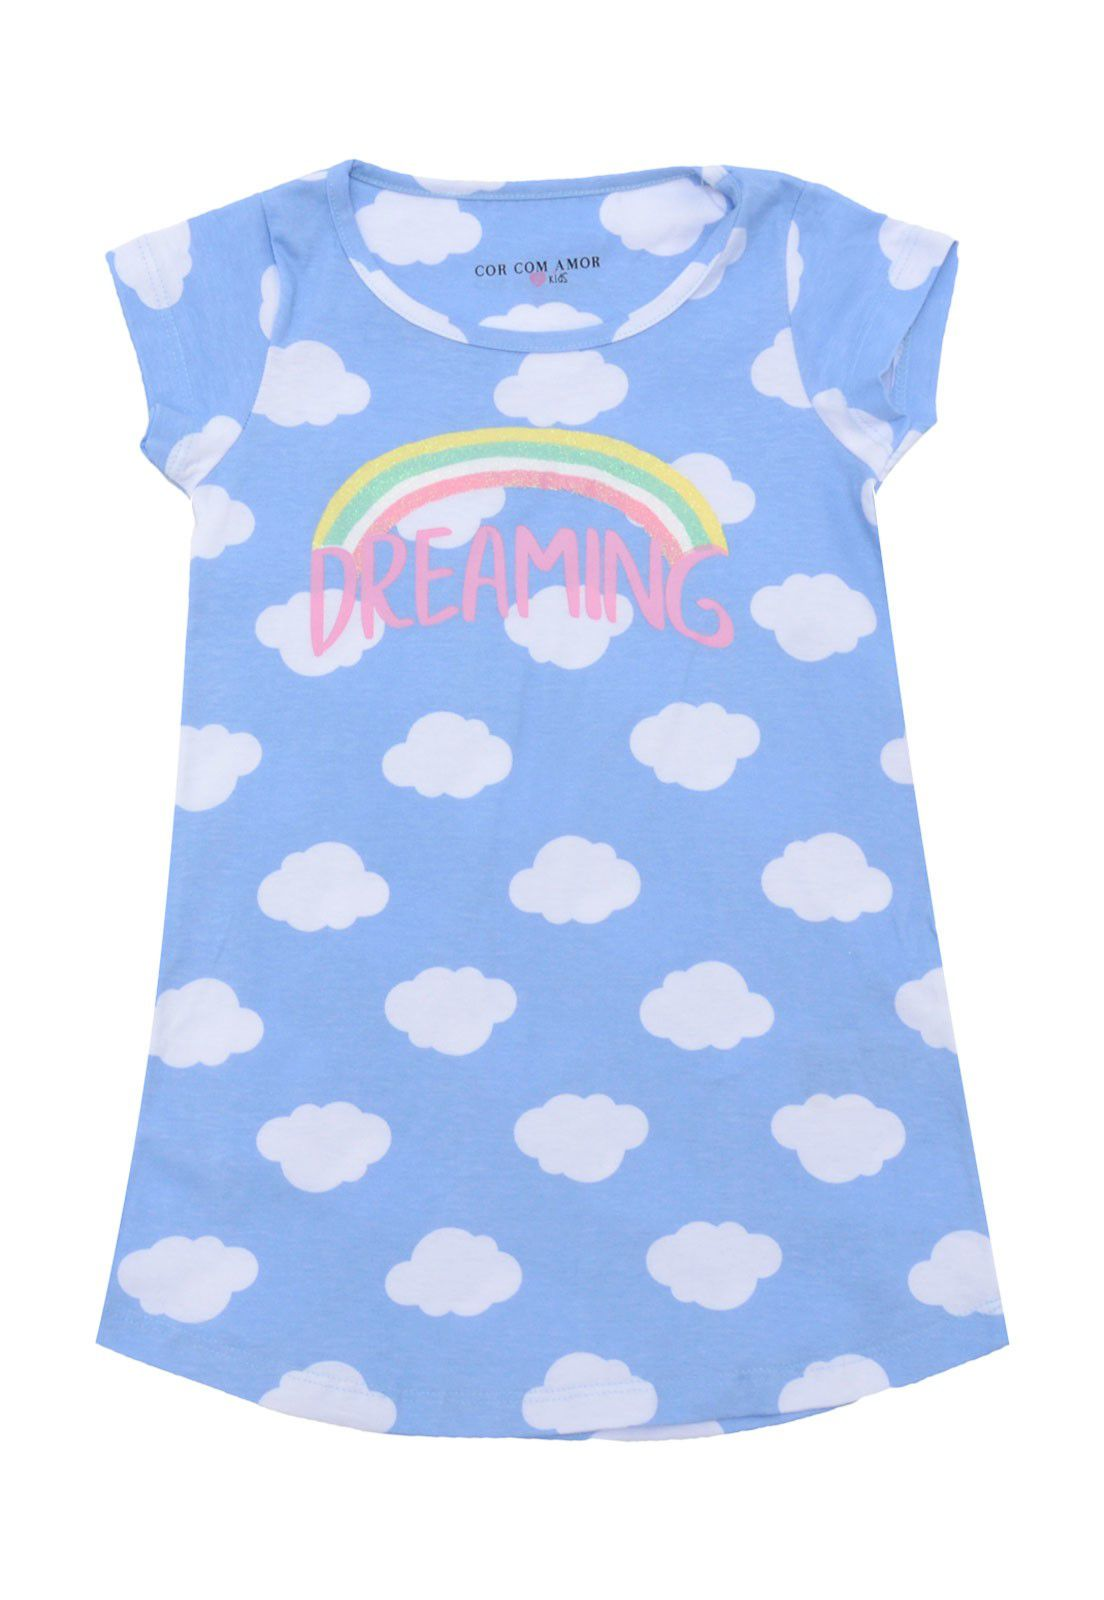 Camisola Manga Curta Infantil Nuvens